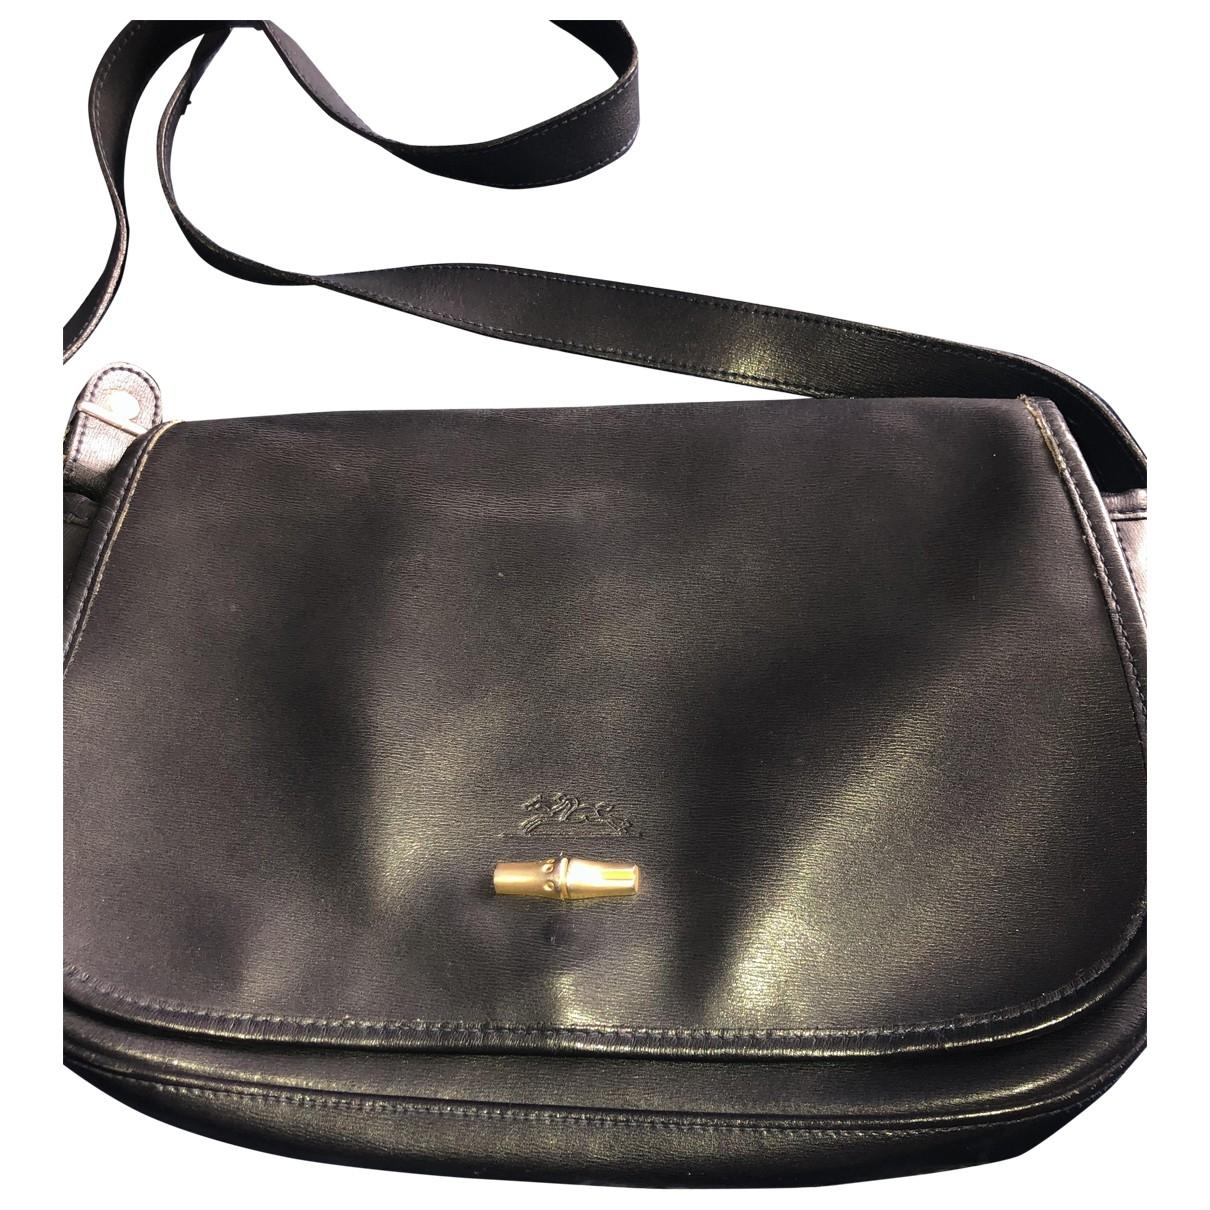 Longchamp \N Handtasche in  Marine Leder